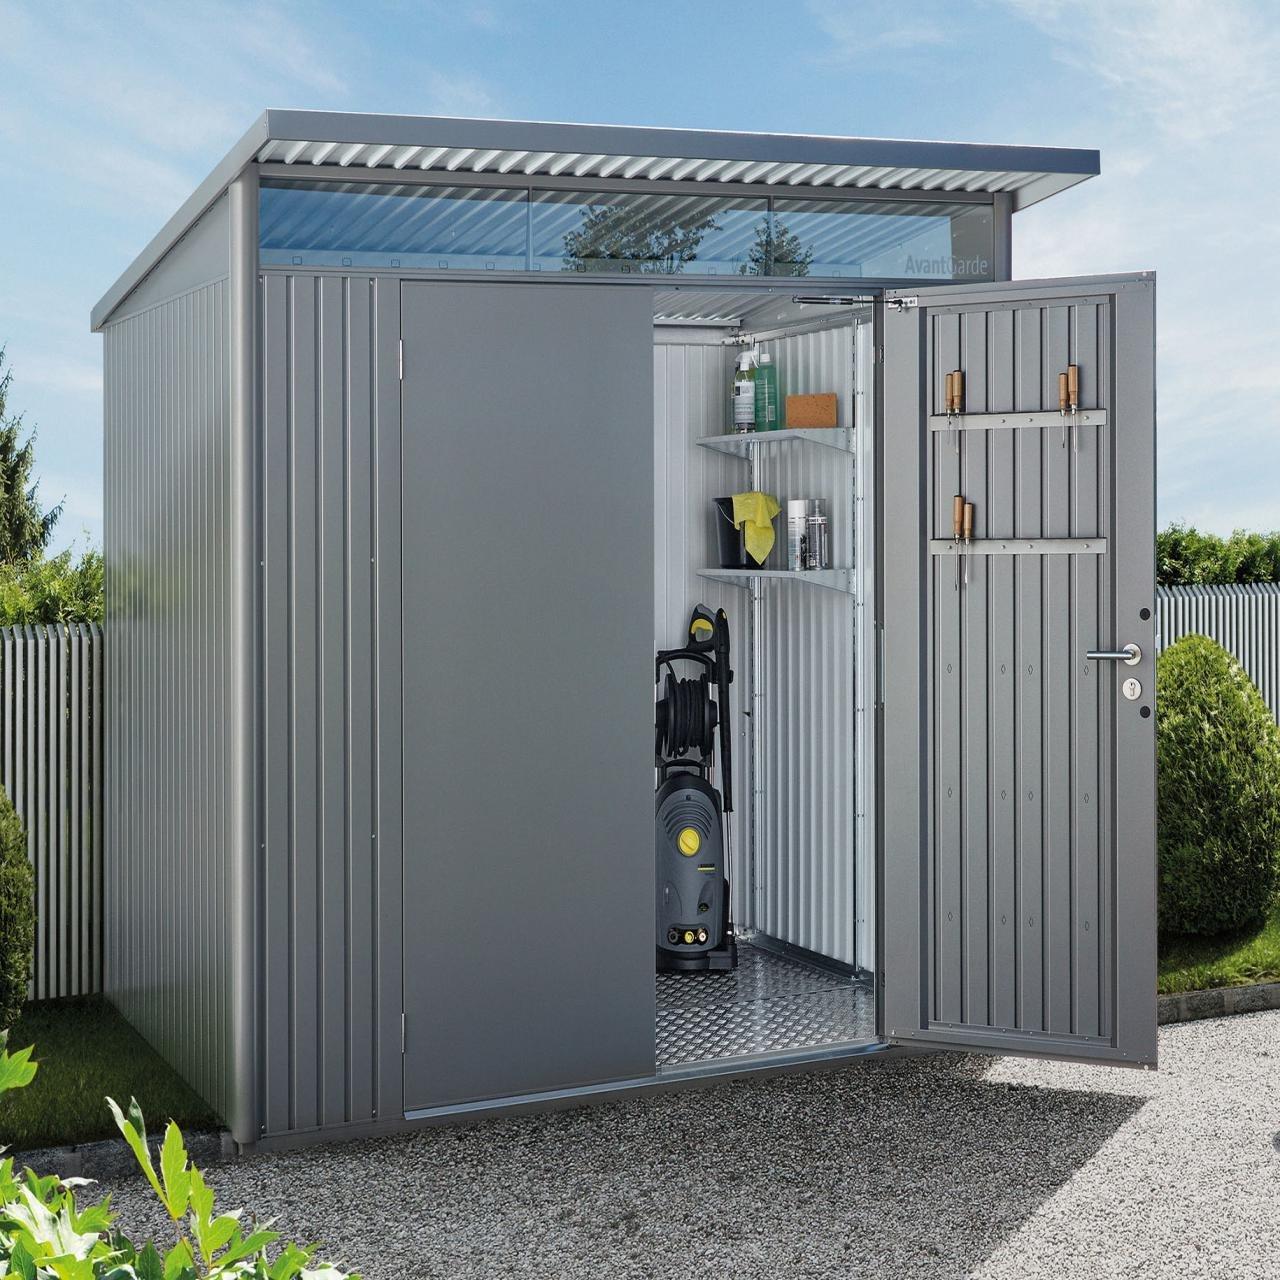 abri de jardin biohort avantgarde avec porte standard. Black Bedroom Furniture Sets. Home Design Ideas